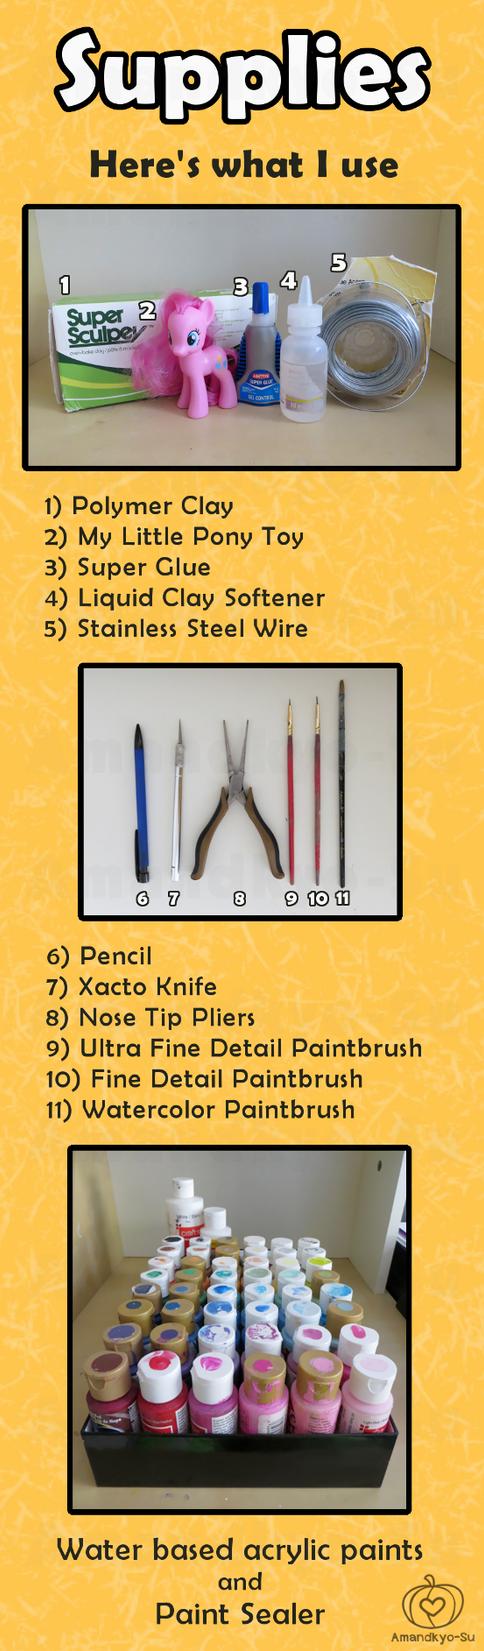 My Little Pony Custom Guide - Supplies by Amandkyo-Su